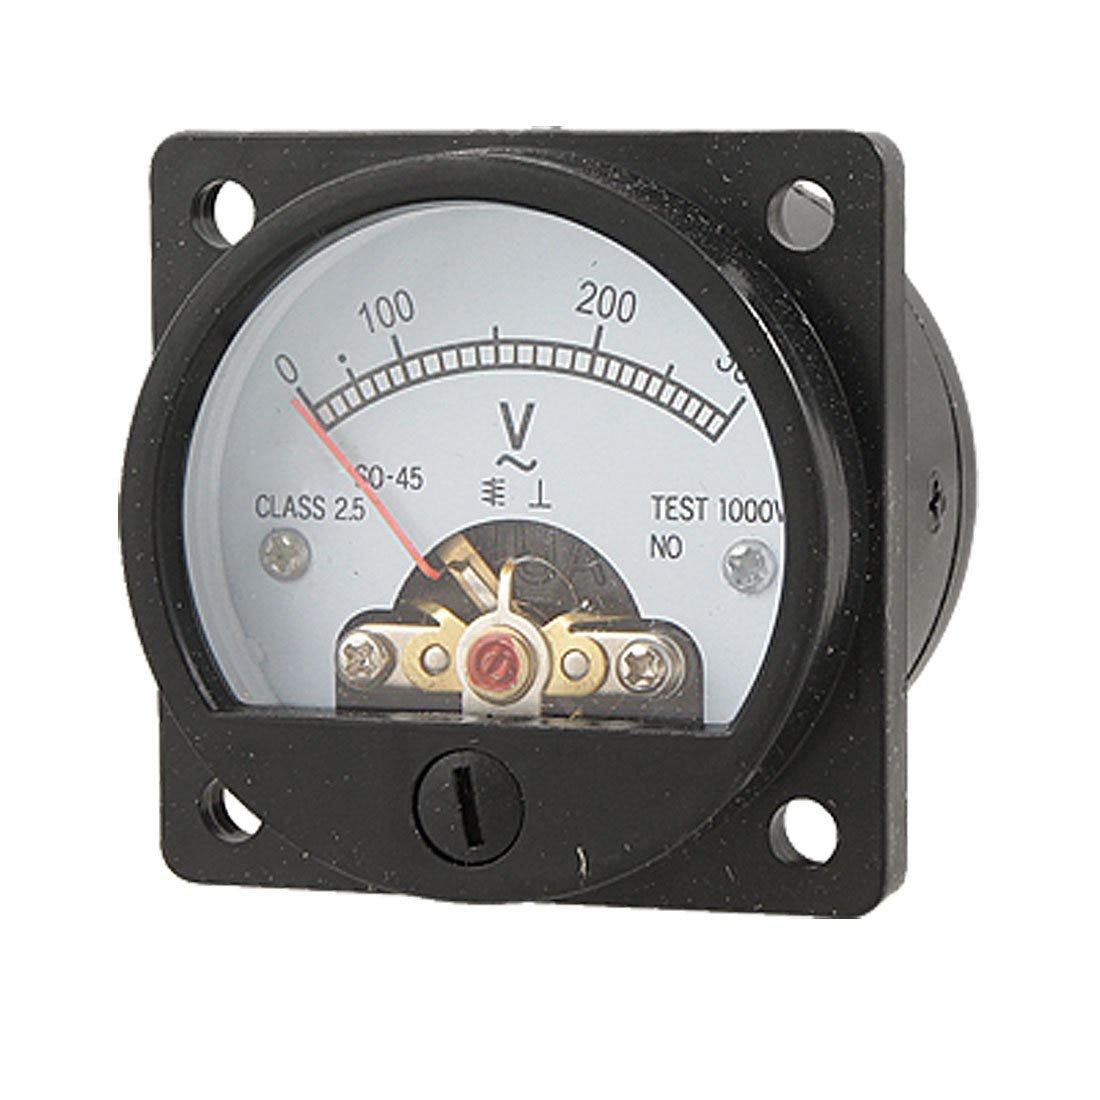 THGS  Hot Sale! Black AC 0-300V Round Analog Dial Panel Meter Voltmeter Gauge